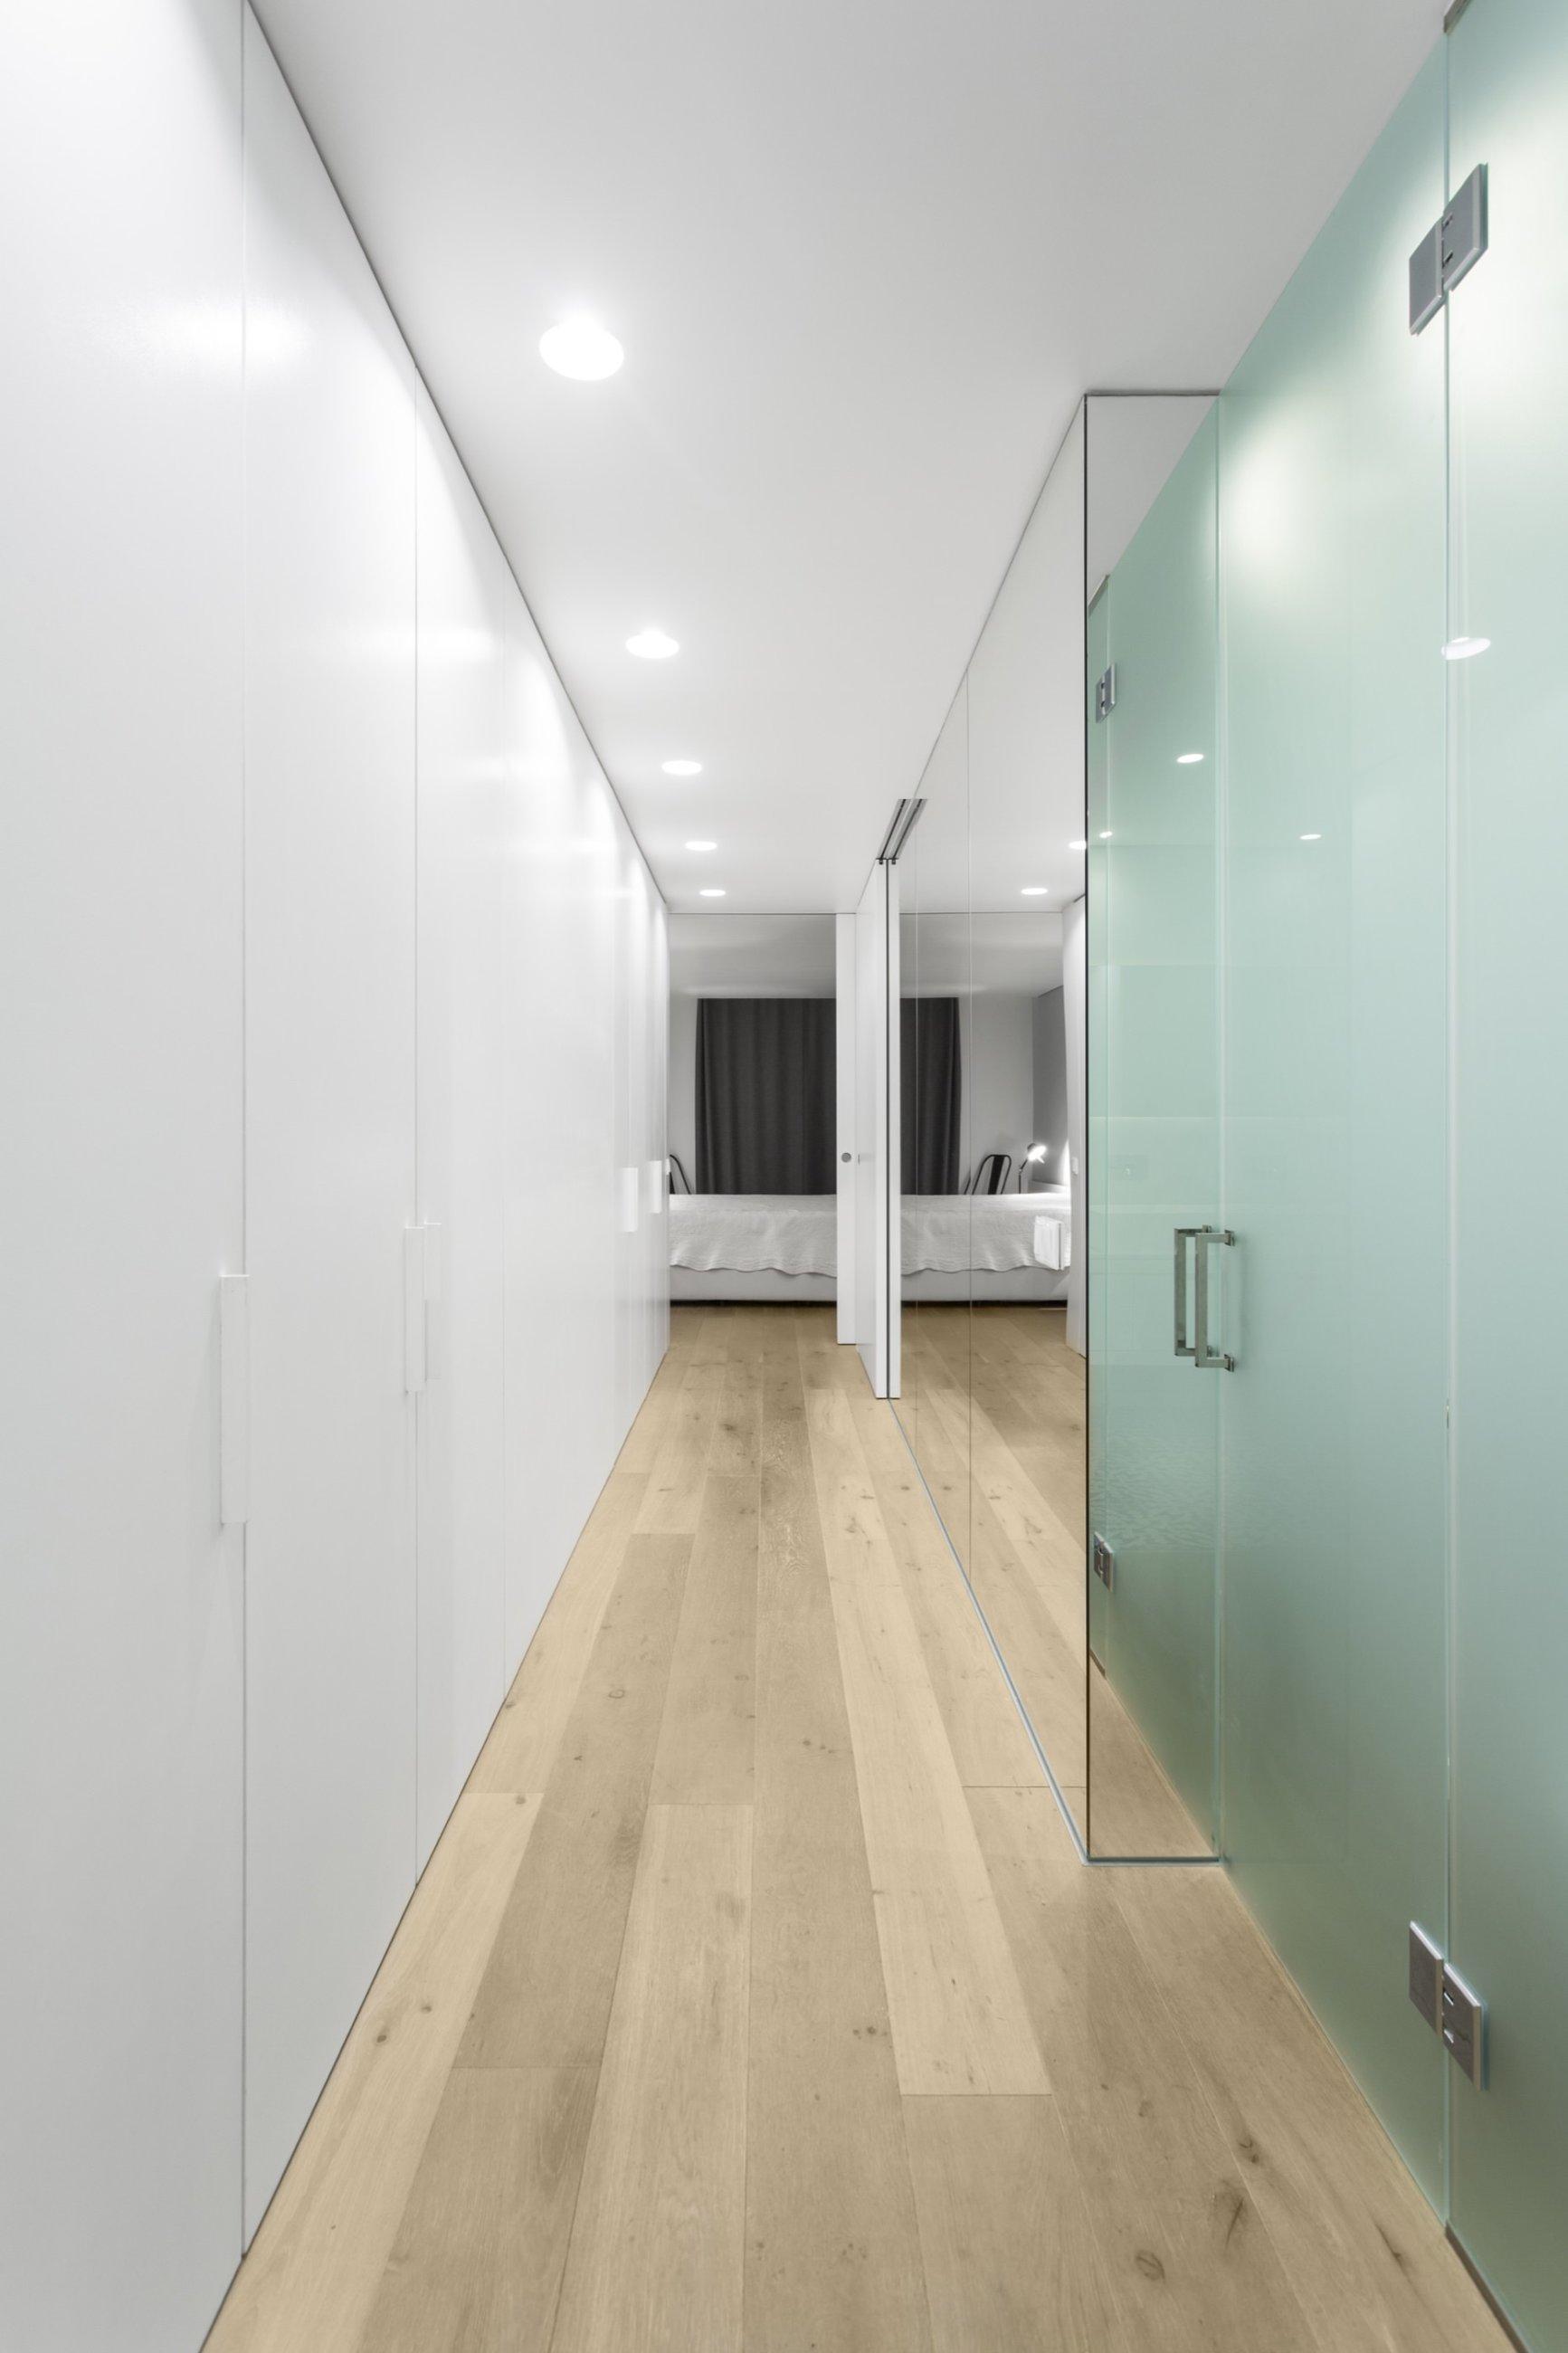 Apartamento Barcelona Arquitecto Paulo Martins 13 do fotografo Ivo Tavares Studio